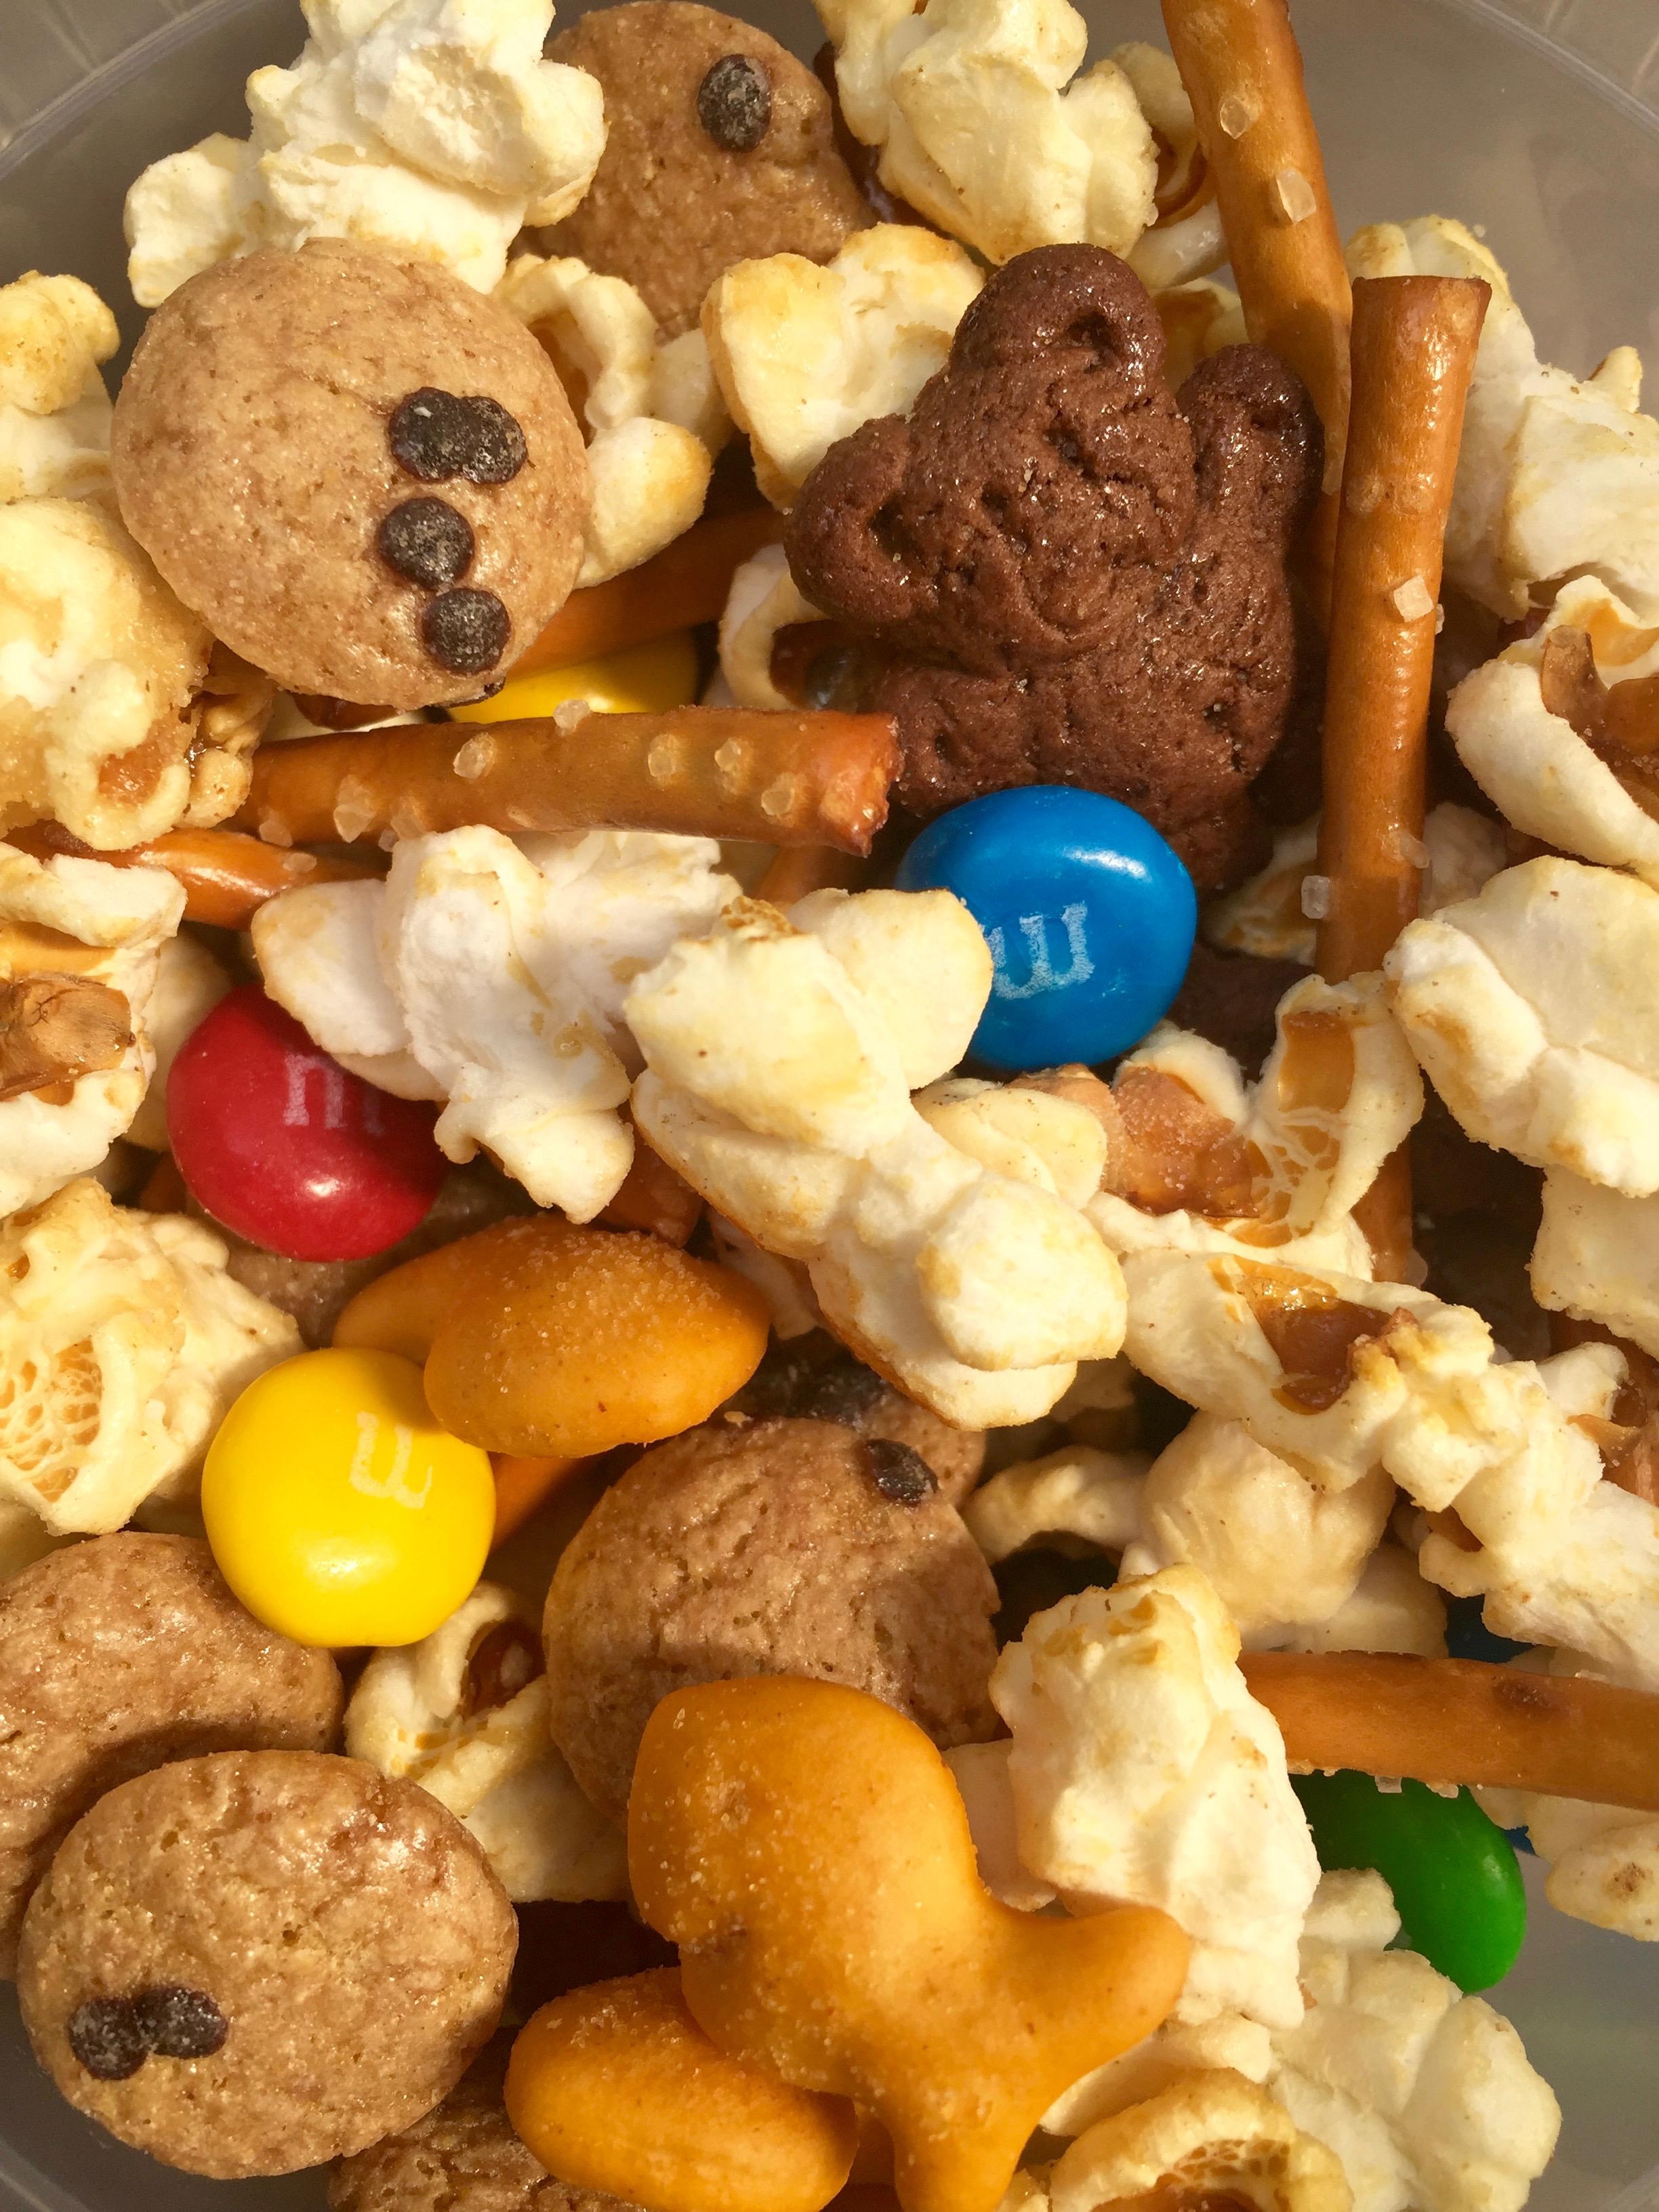 Trashy Trail Mix : Cookie Crisp, Teddy Grahams, Goldfish, M&M's, popcorn, and pretzel sticks